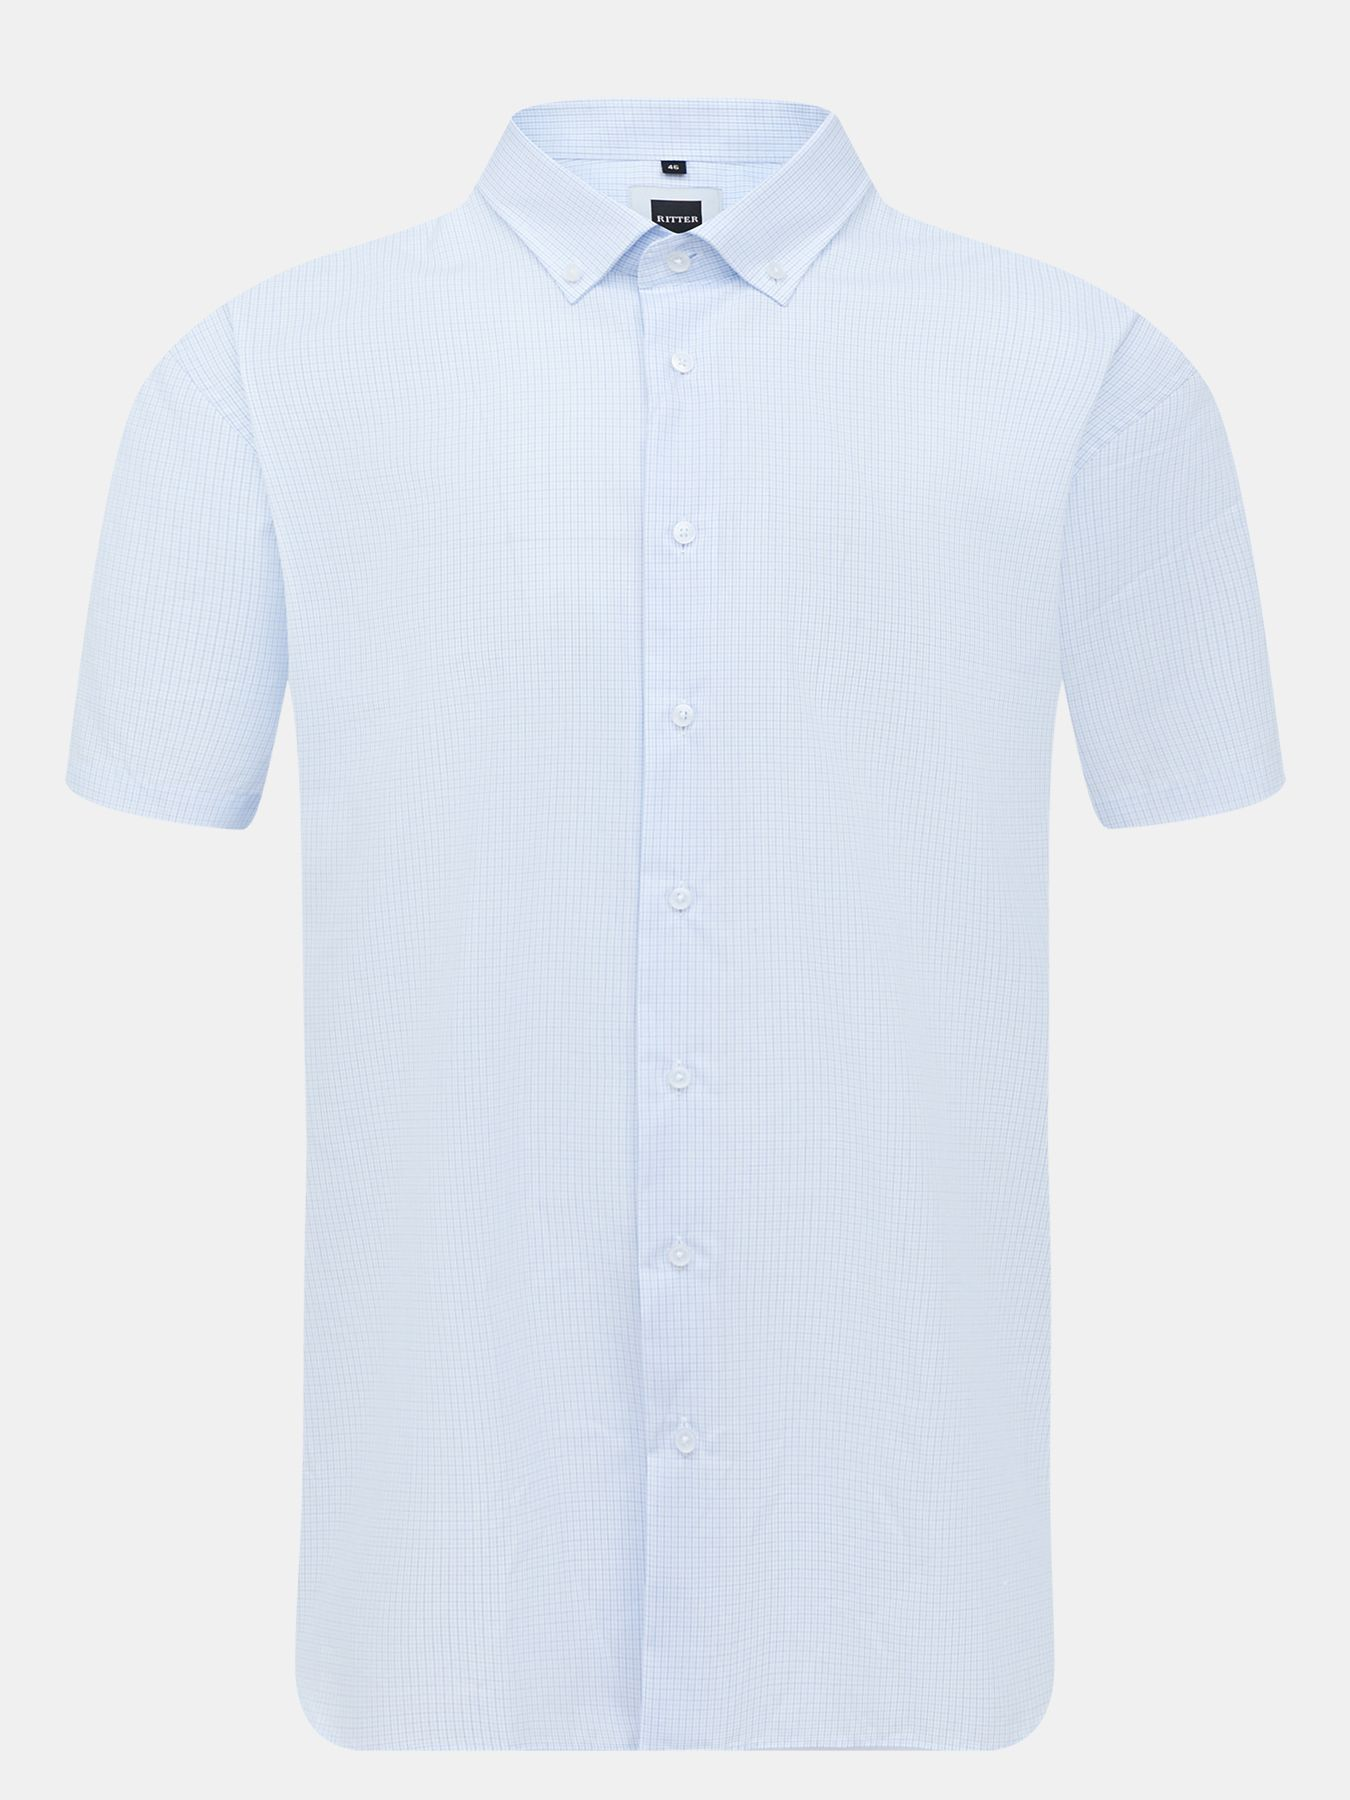 Рубашки Ritter Мужская рубашка рубашка мужская ancient sharks y23412700 23412700